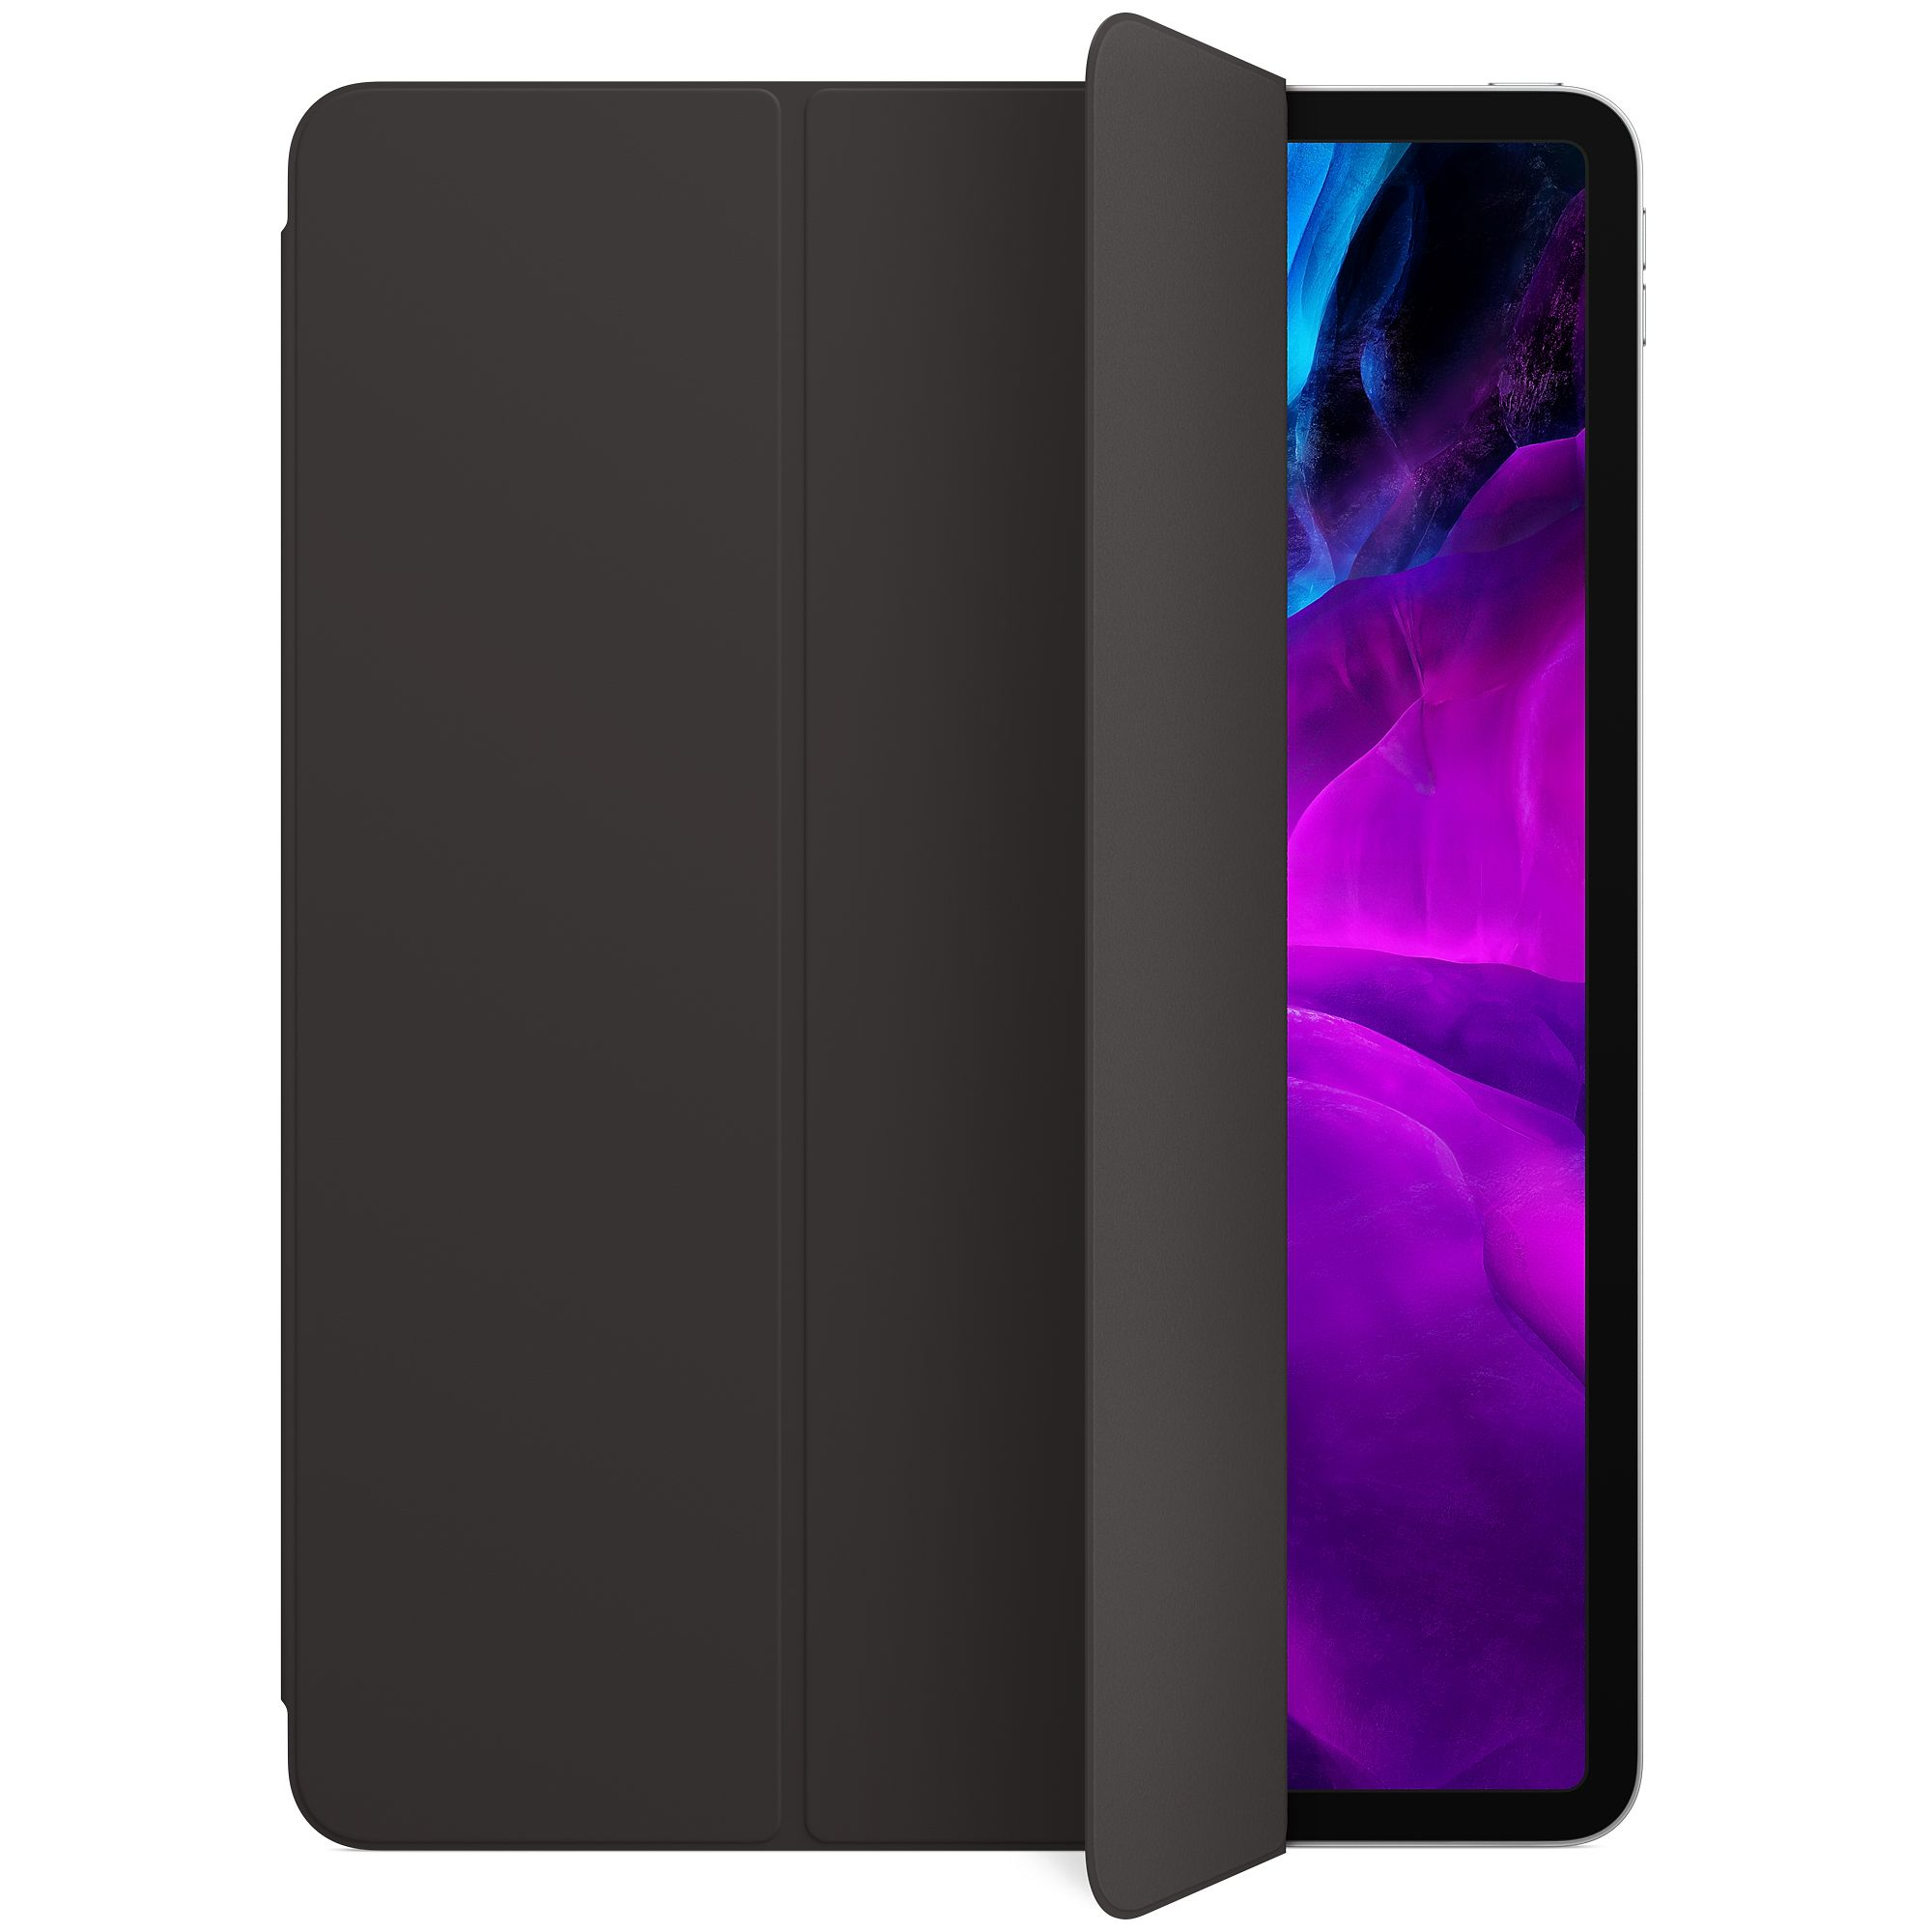 "Чехол Apple Smart Folio для iPad Pro 12.9"" Black MXT92"